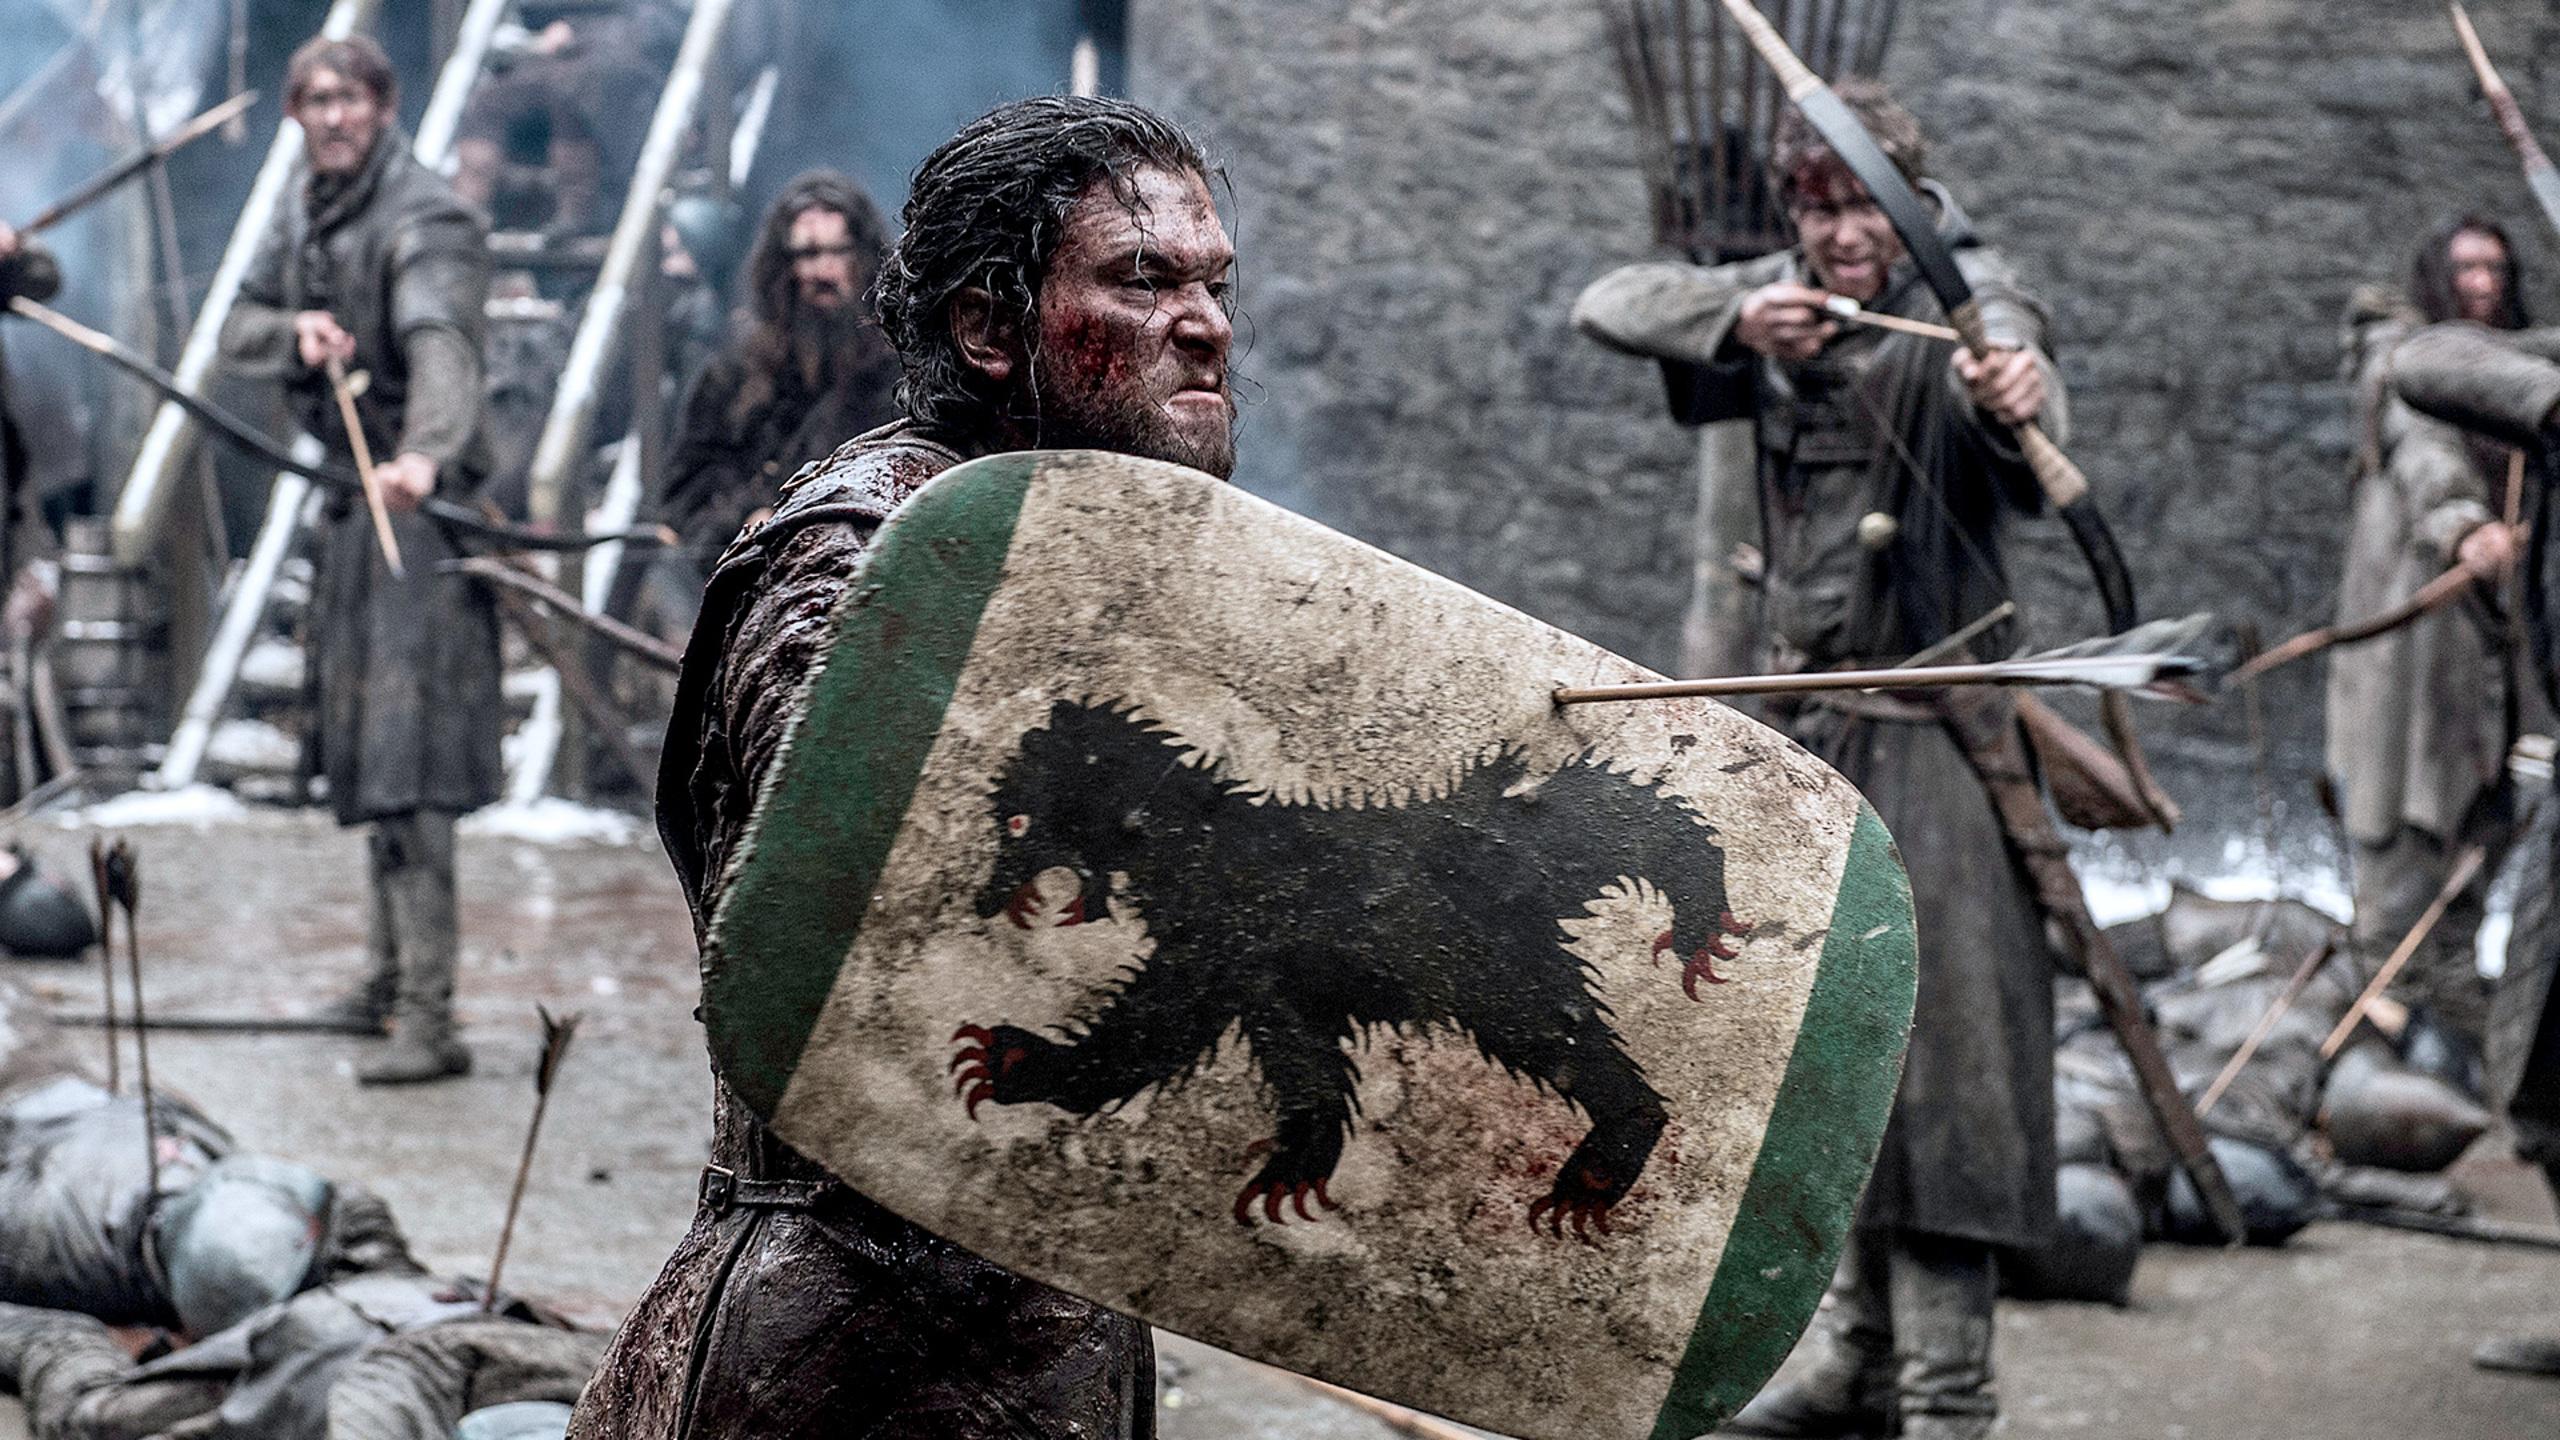 2560x1440 Jon Snow Battle Of The Bastards 1440p Resolution Hd 4k